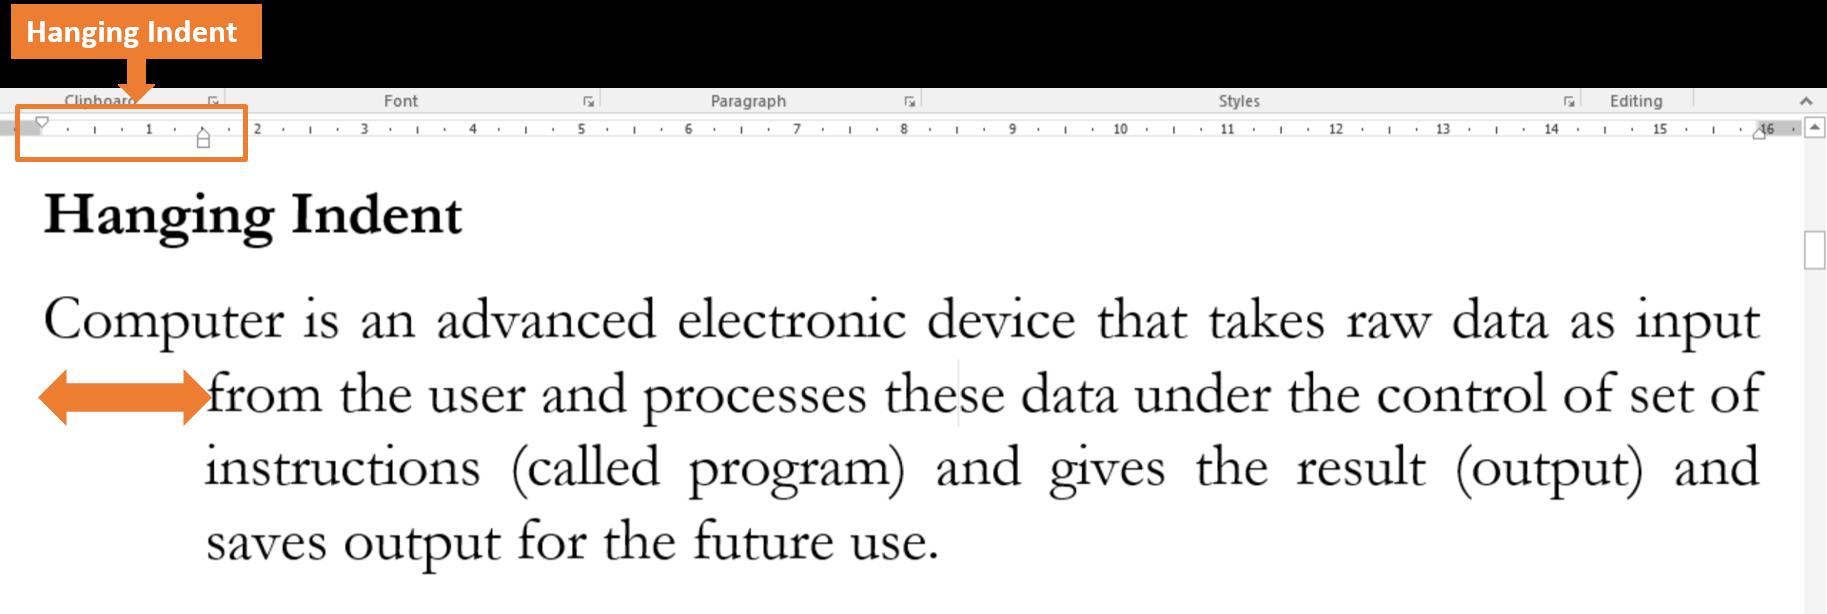 MS-Word Line Paragraph Spacing